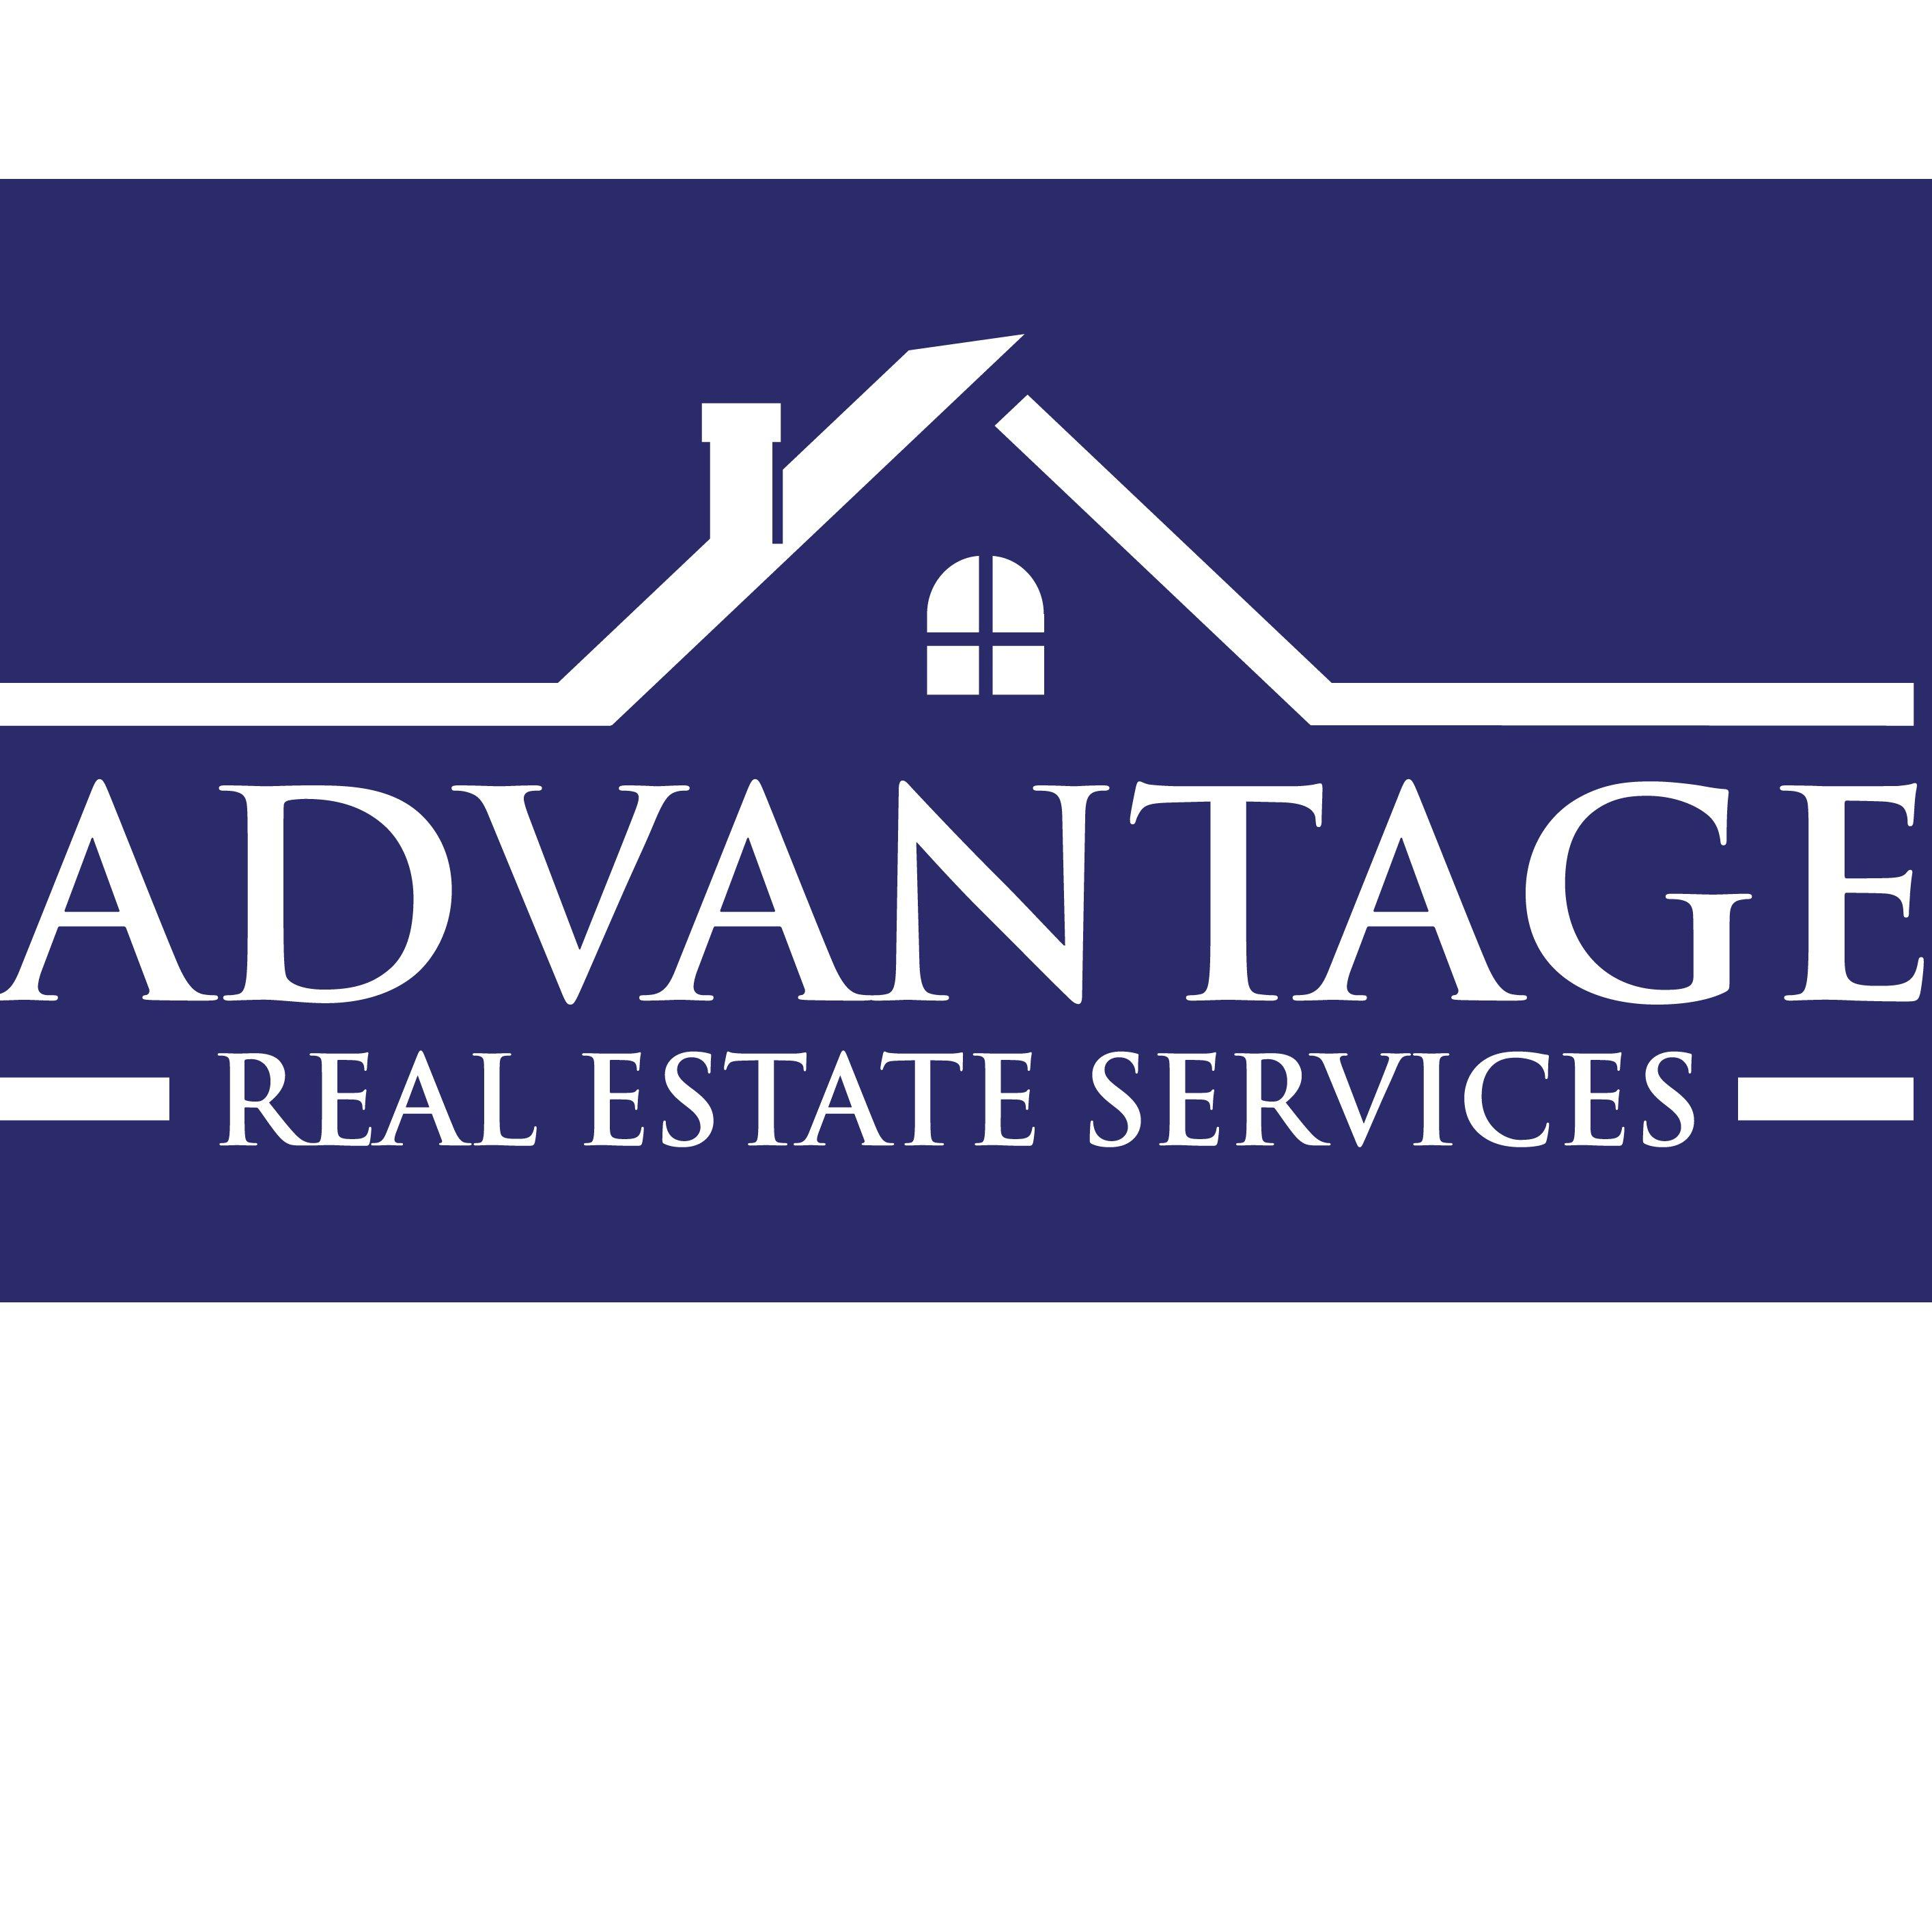 Advantage Real Estate Services - Land O Lakes, FL 34639 - (813)996-4747   ShowMeLocal.com